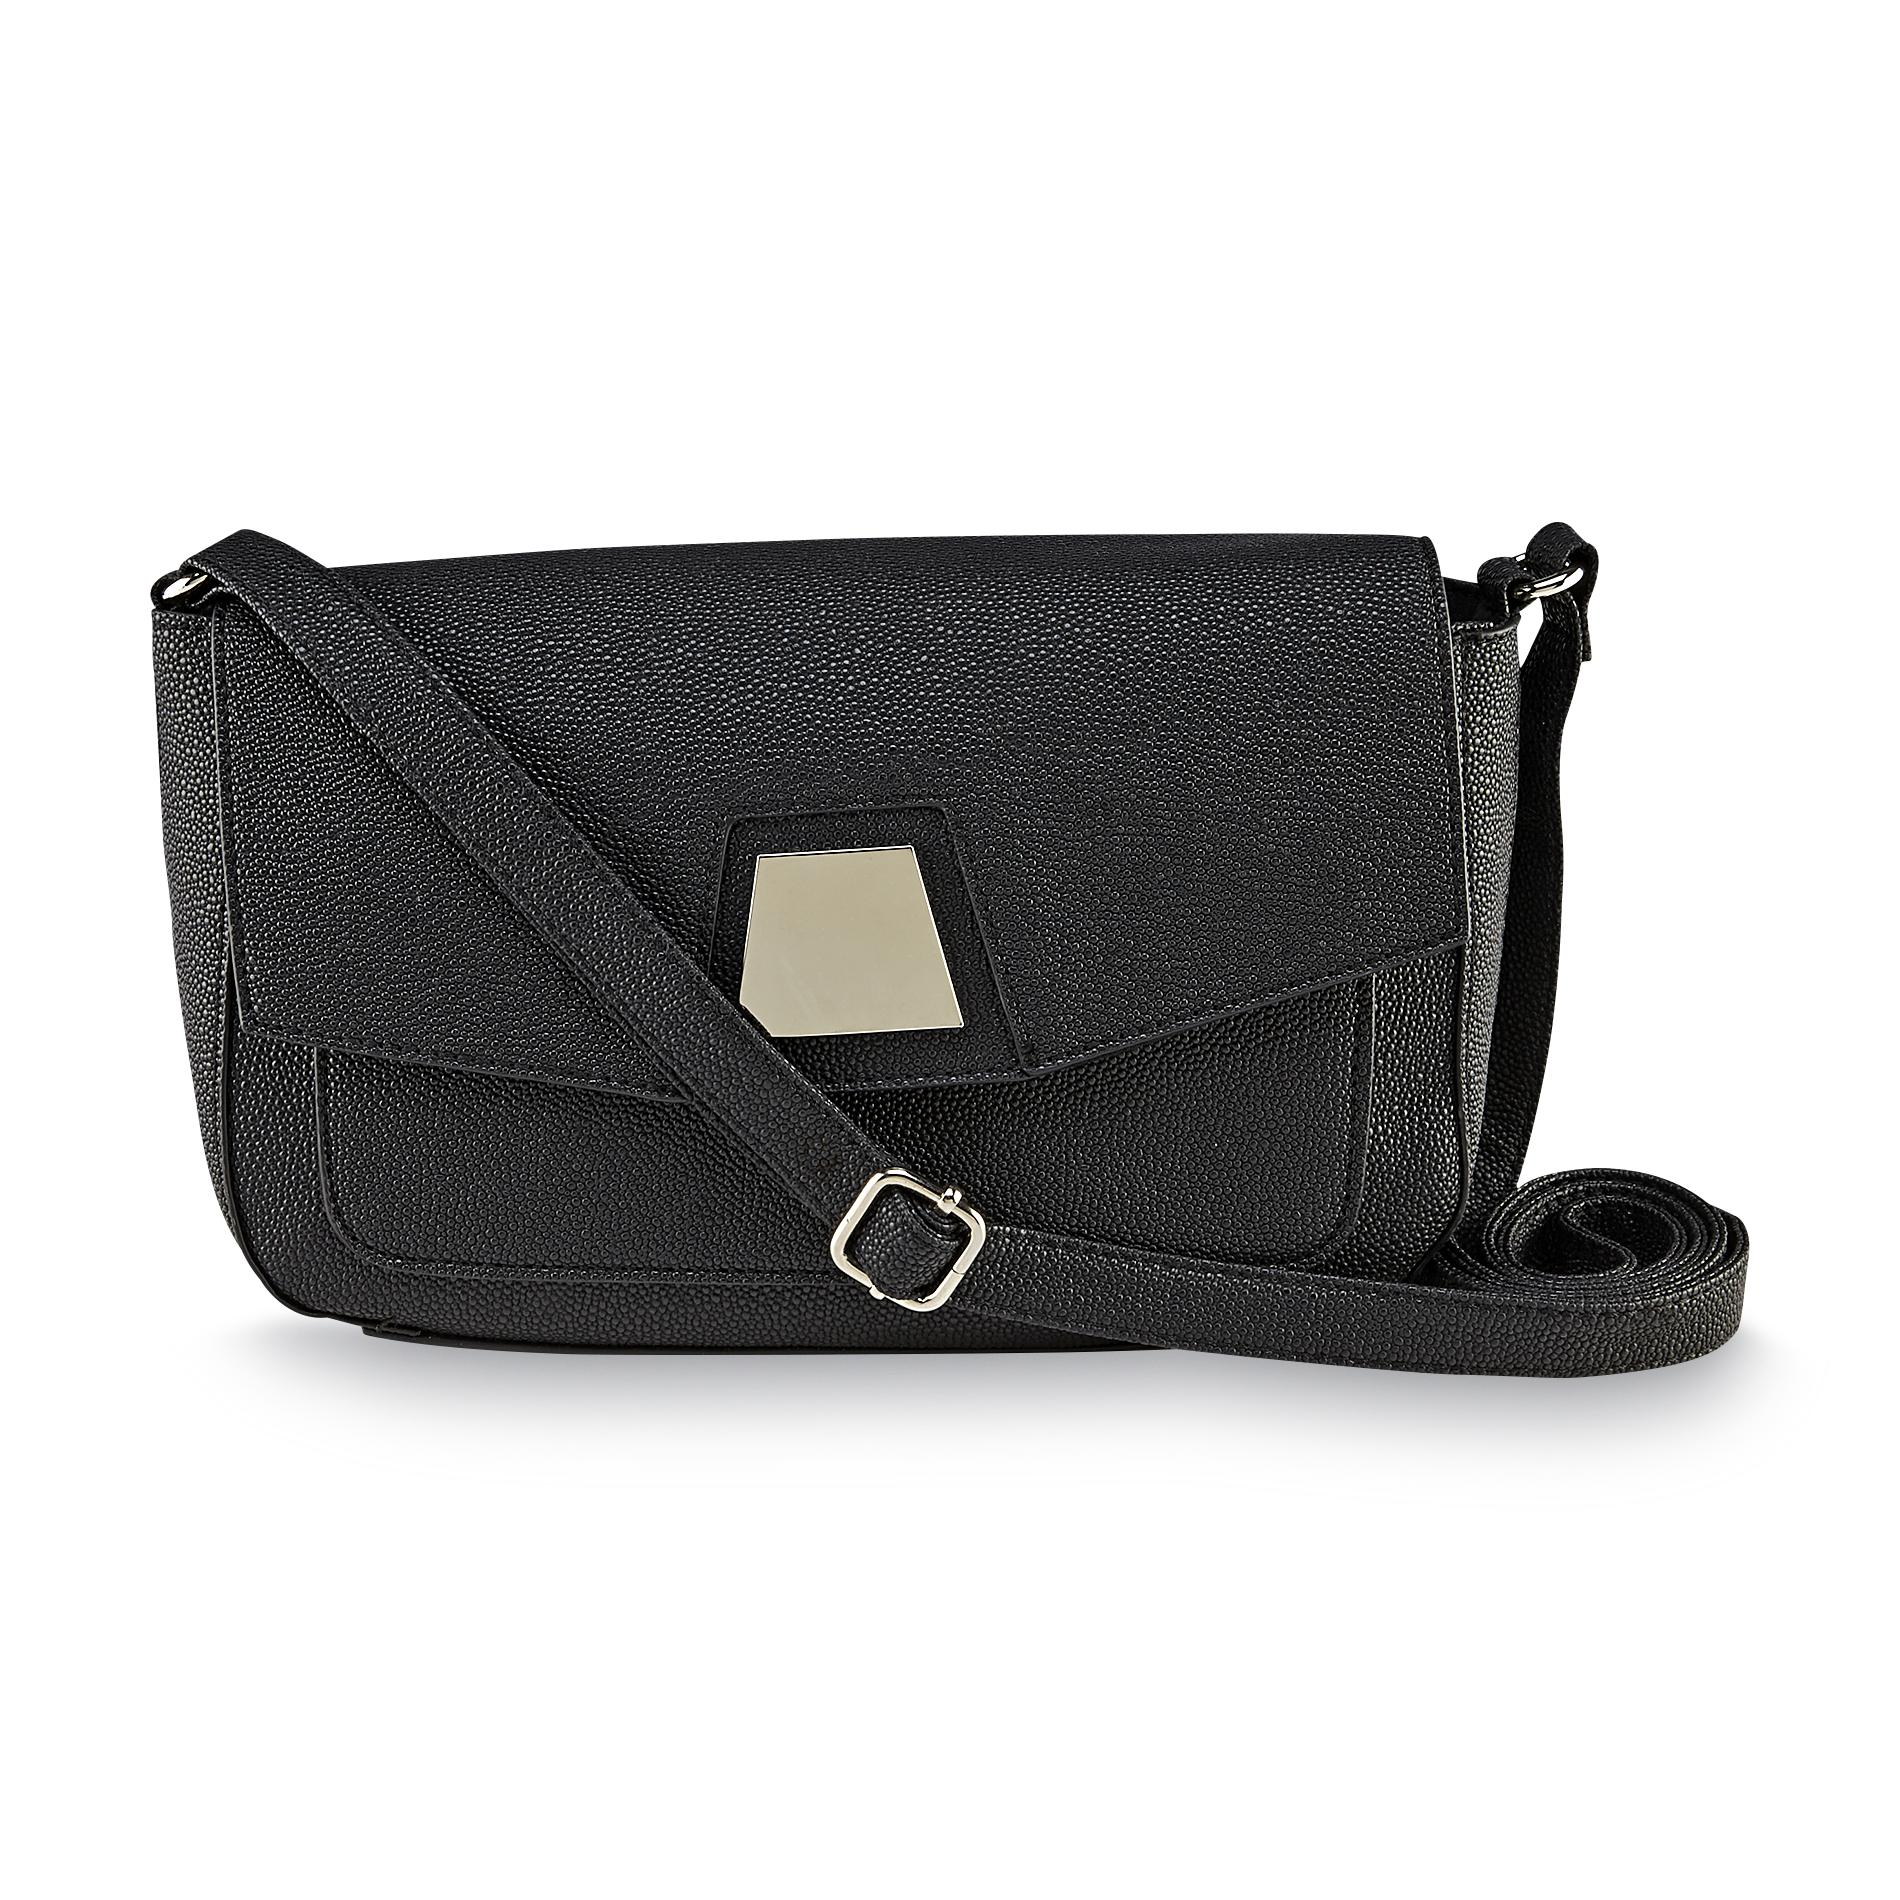 Attention Women's Flap Down Crossbody Bag - Stingray